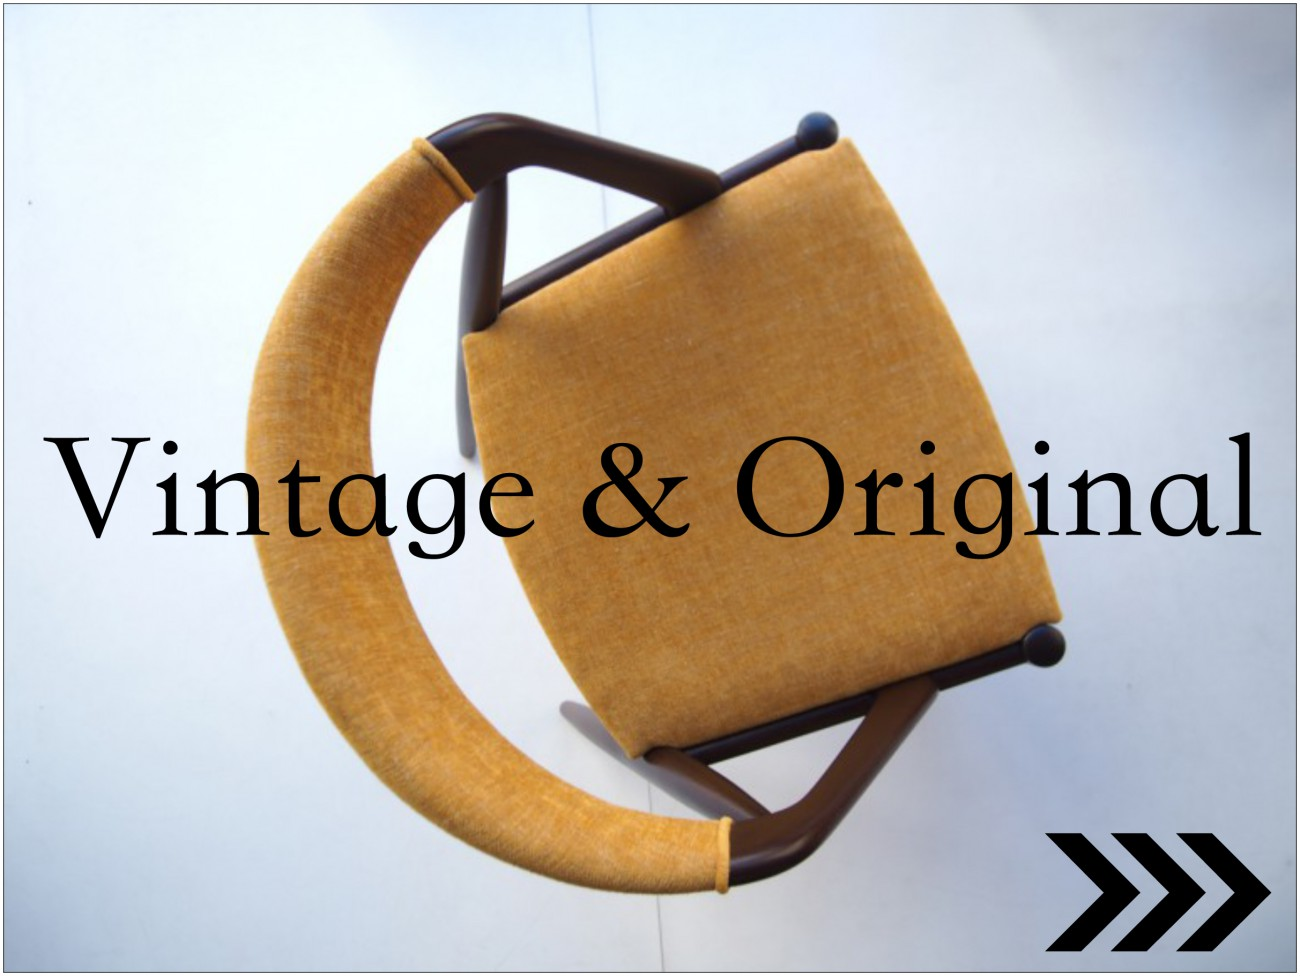 vintage&original